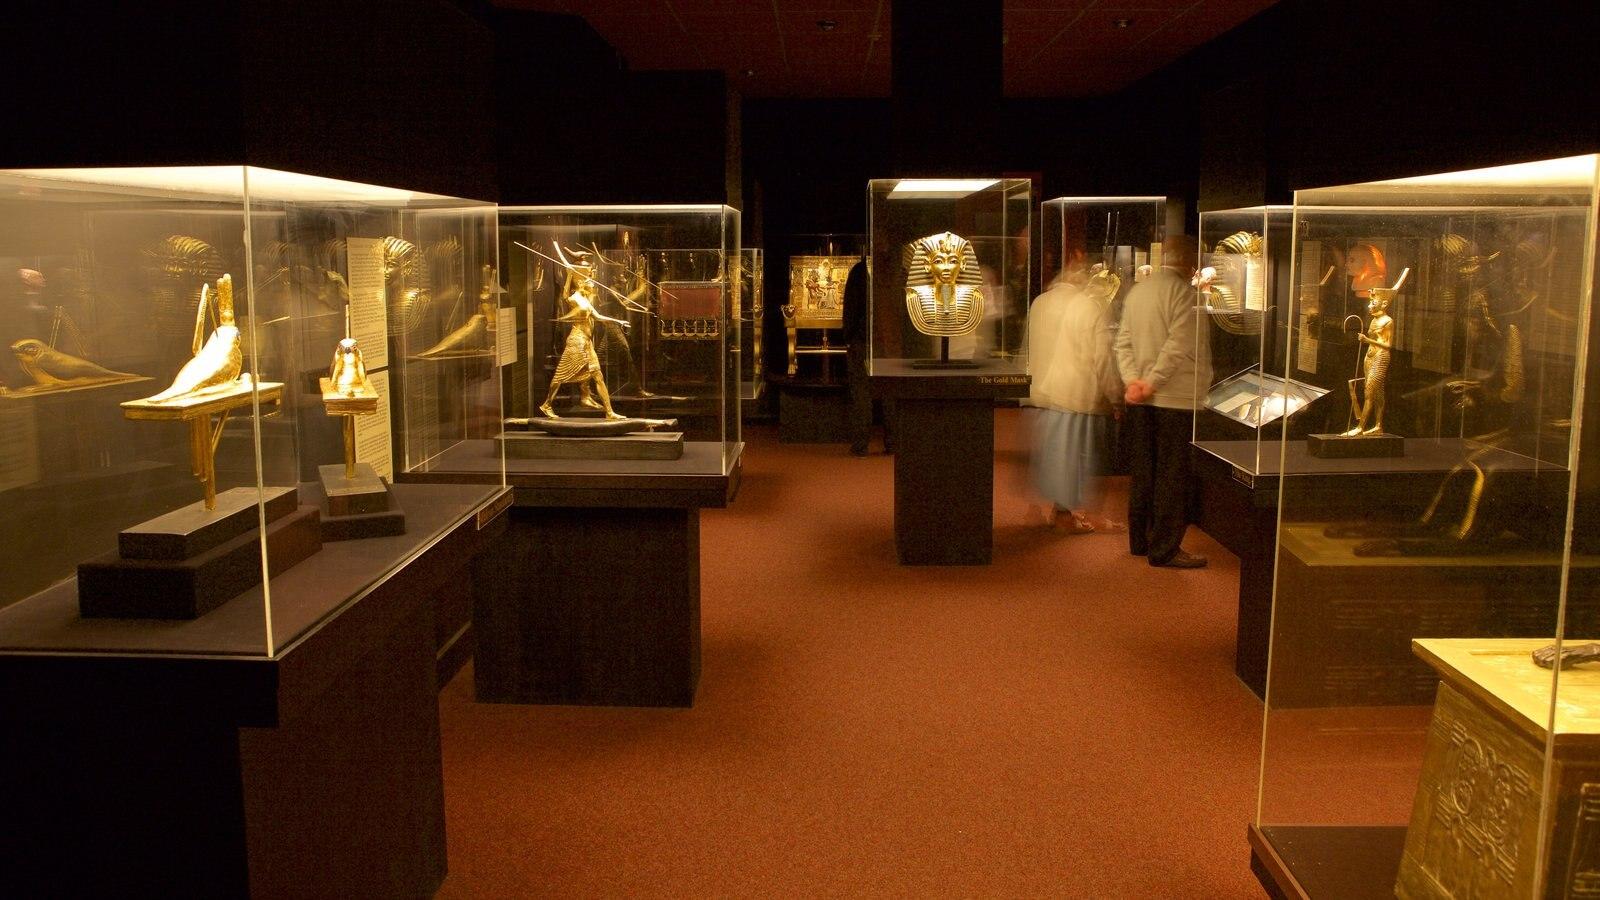 Tutankamon a exposição caracterizando elementos de patrimônio e vistas internas